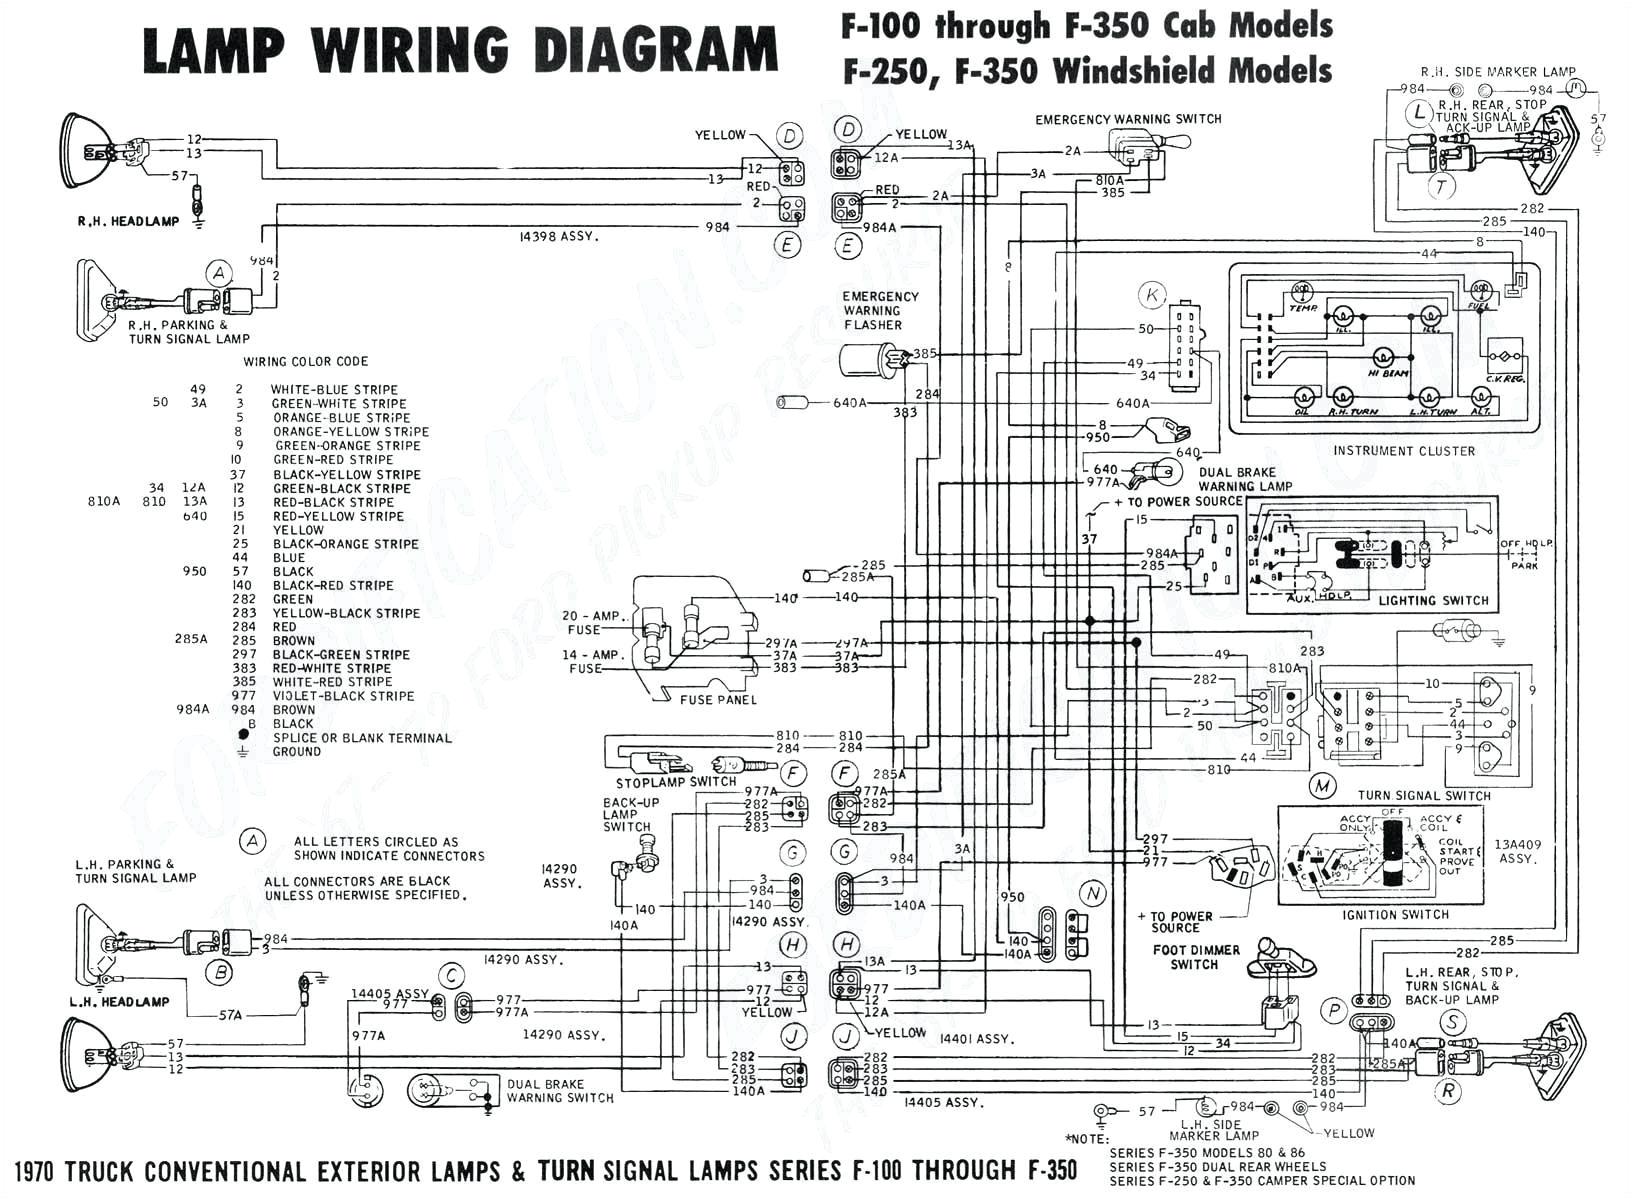 2006 ford f 250 van fuse diagram wiring diagram paper mitsubishi montero sport